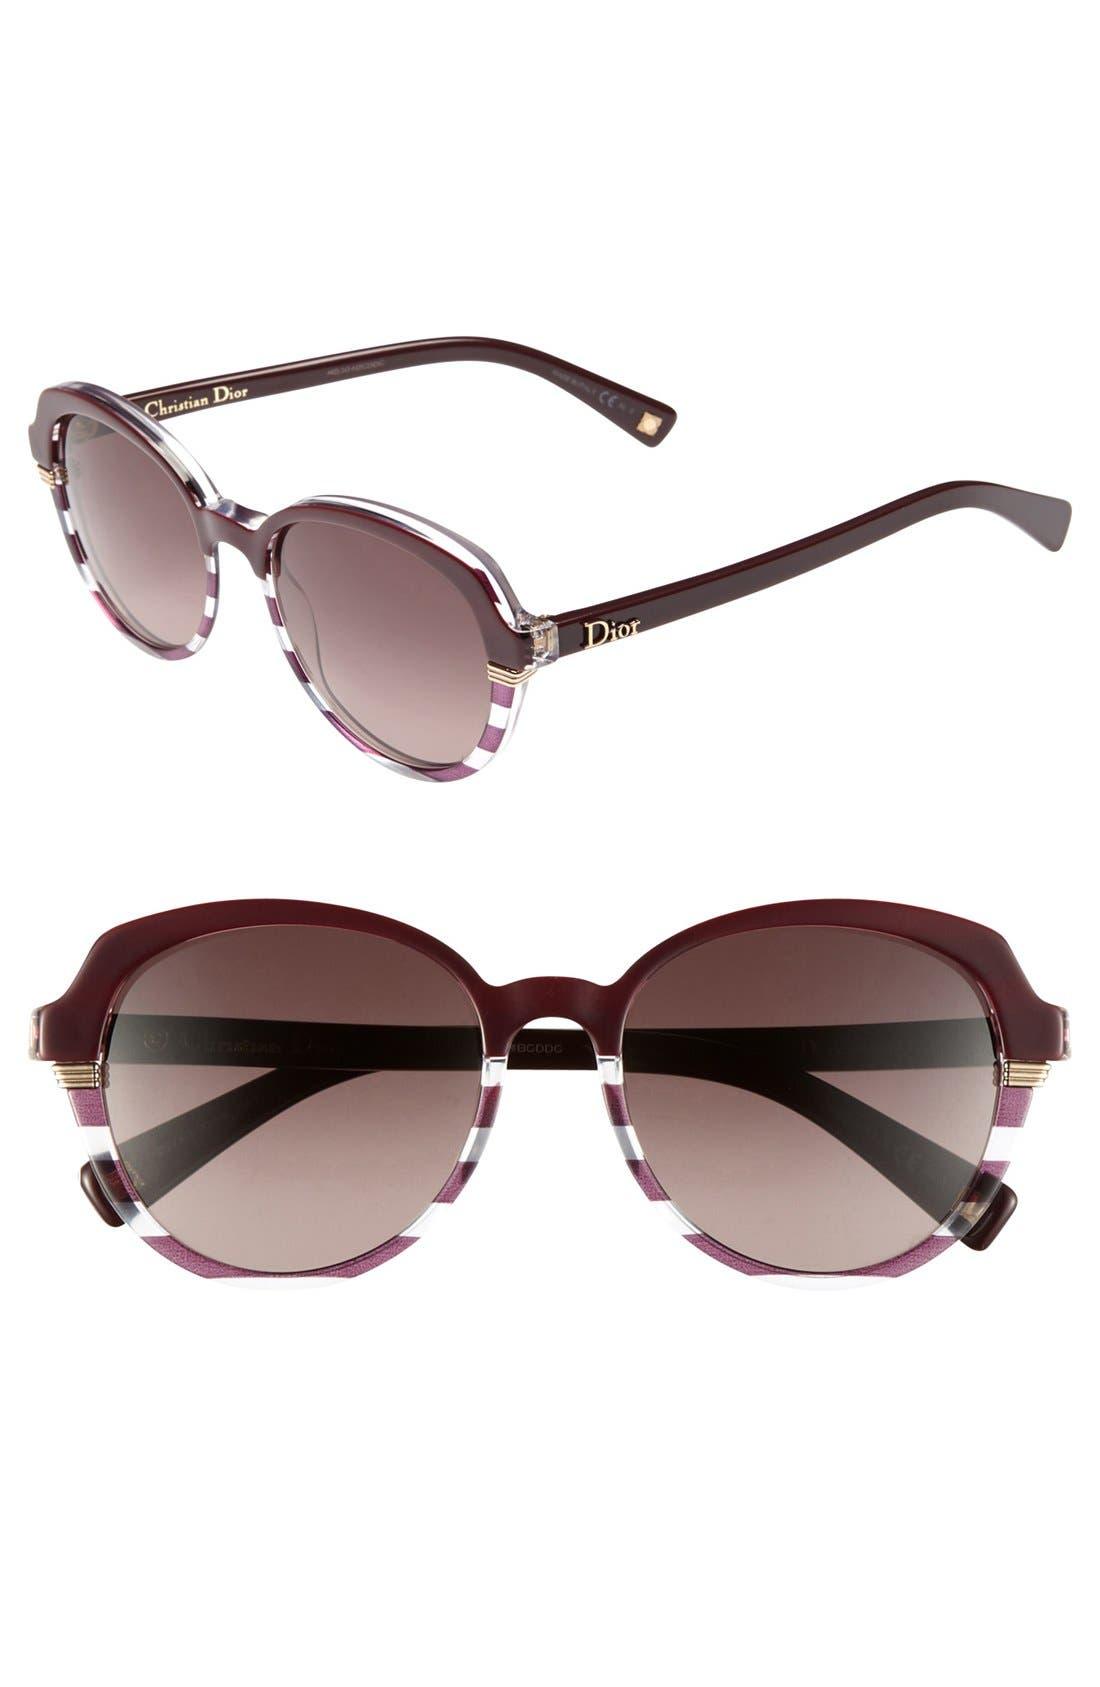 Main Image - Dior 'Croisette 3' Retro Sunglasses